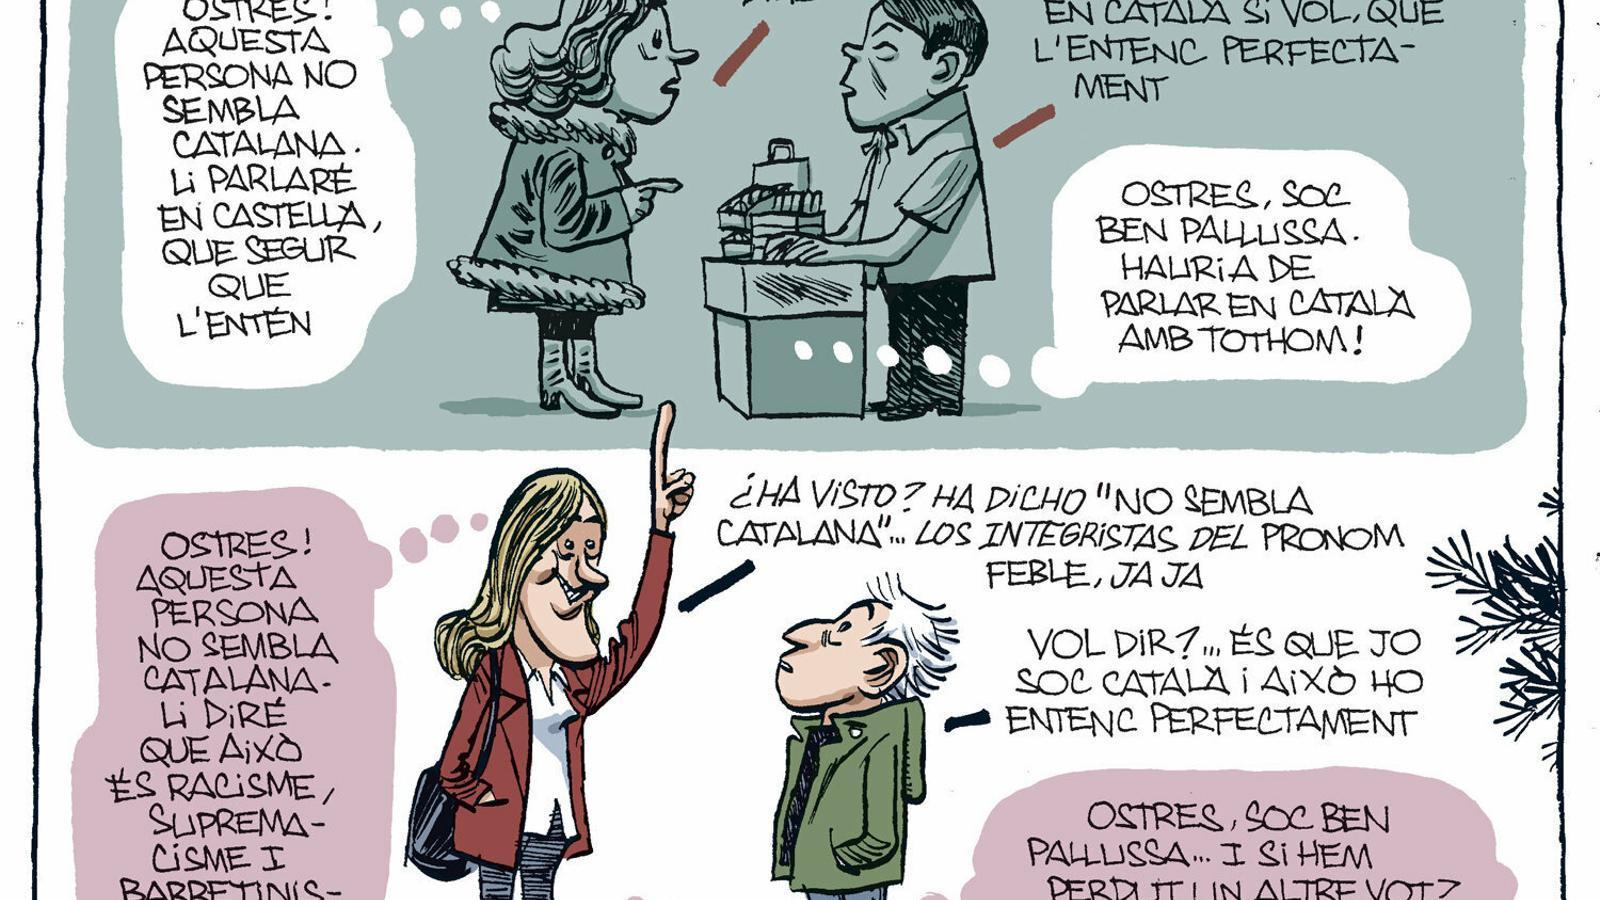 La vinyeta de Manel Fontdevila 16/02/2020